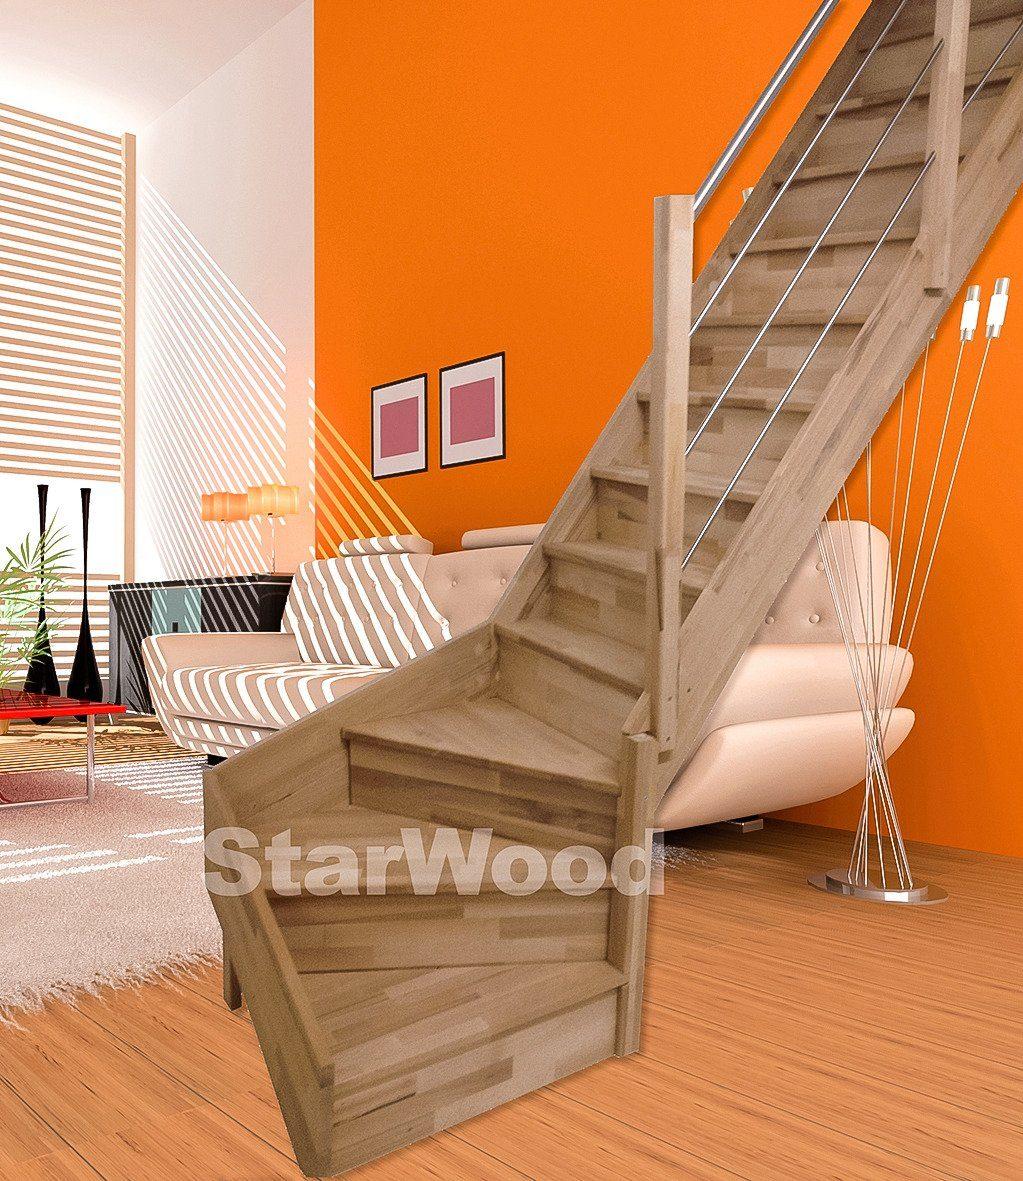 STARWOOD Raumspartreppe »Rhodos«, geschl. Stufen, 1/4 rechts gewendelt, Holz-Edelstahlgel. re